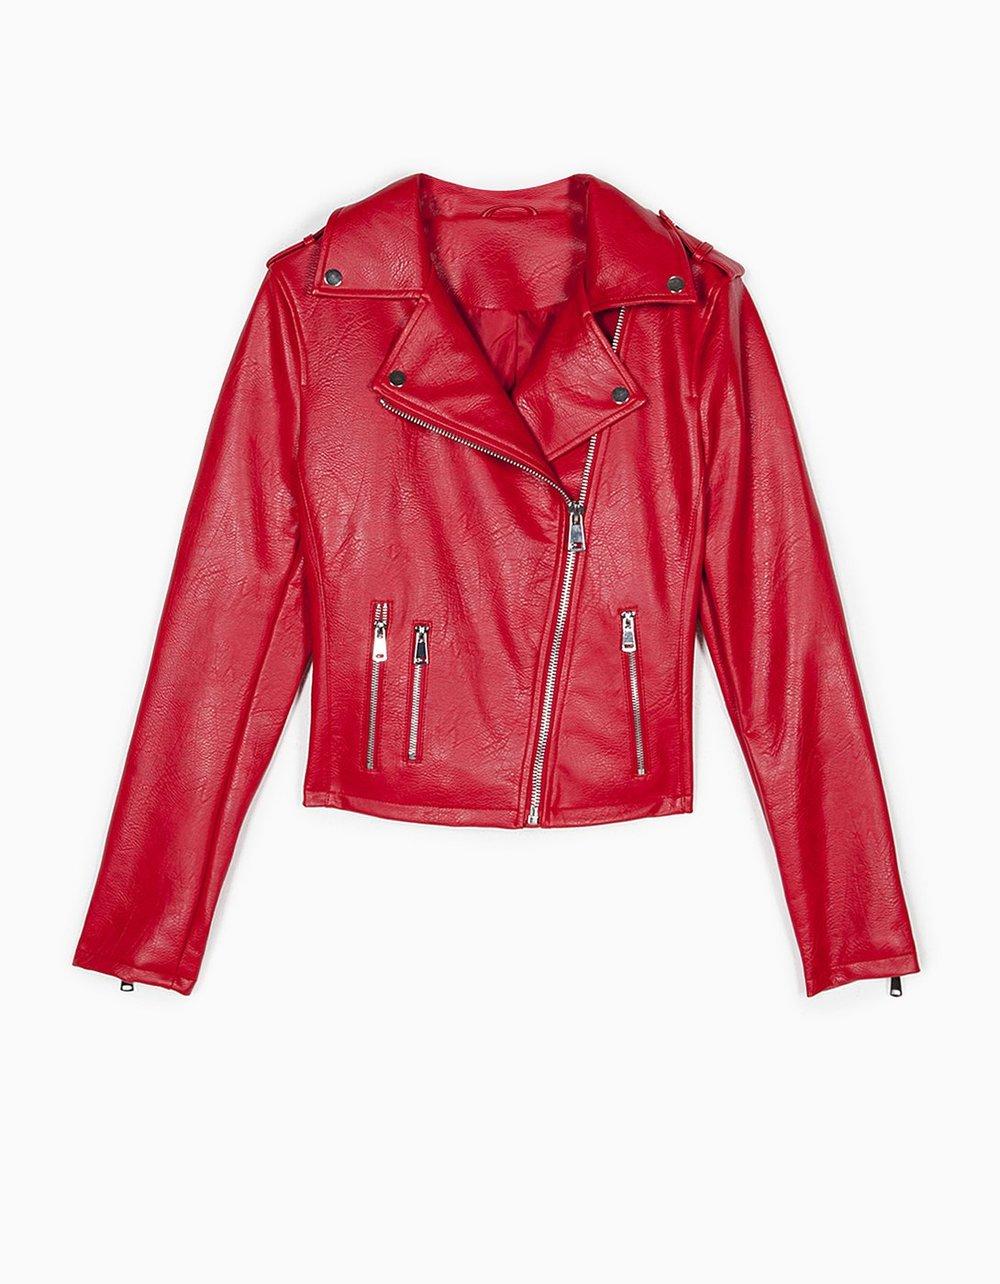 red biker jacket.jpg